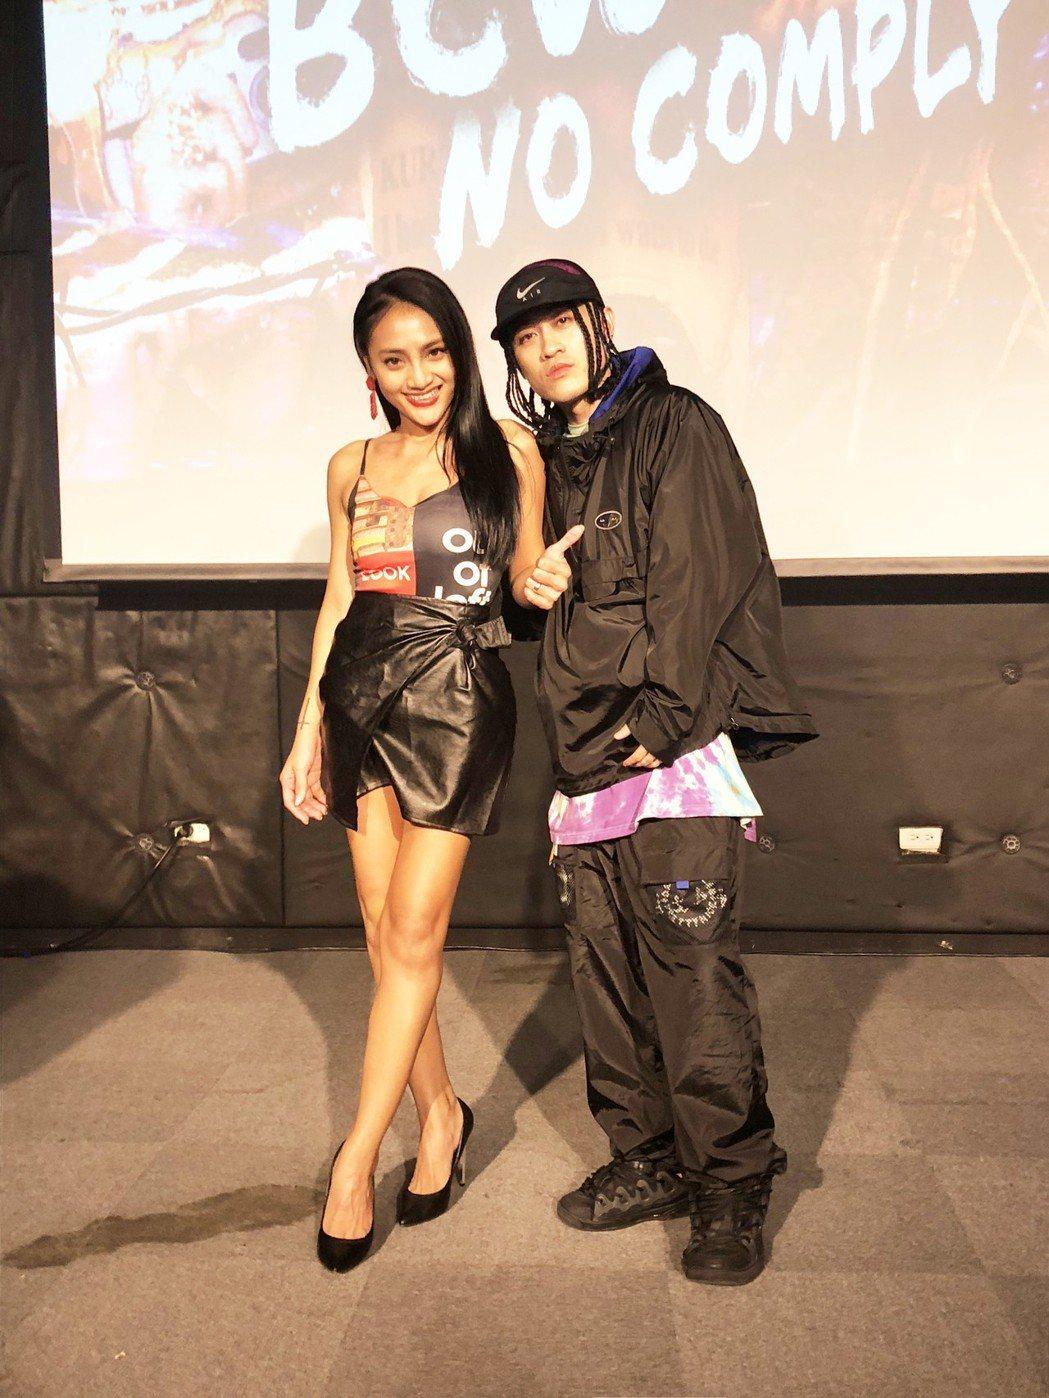 BCW近來推出新歌「東岸」,高雄站演唱找來葉瑋庭(左)。圖/混血兒娛樂提供